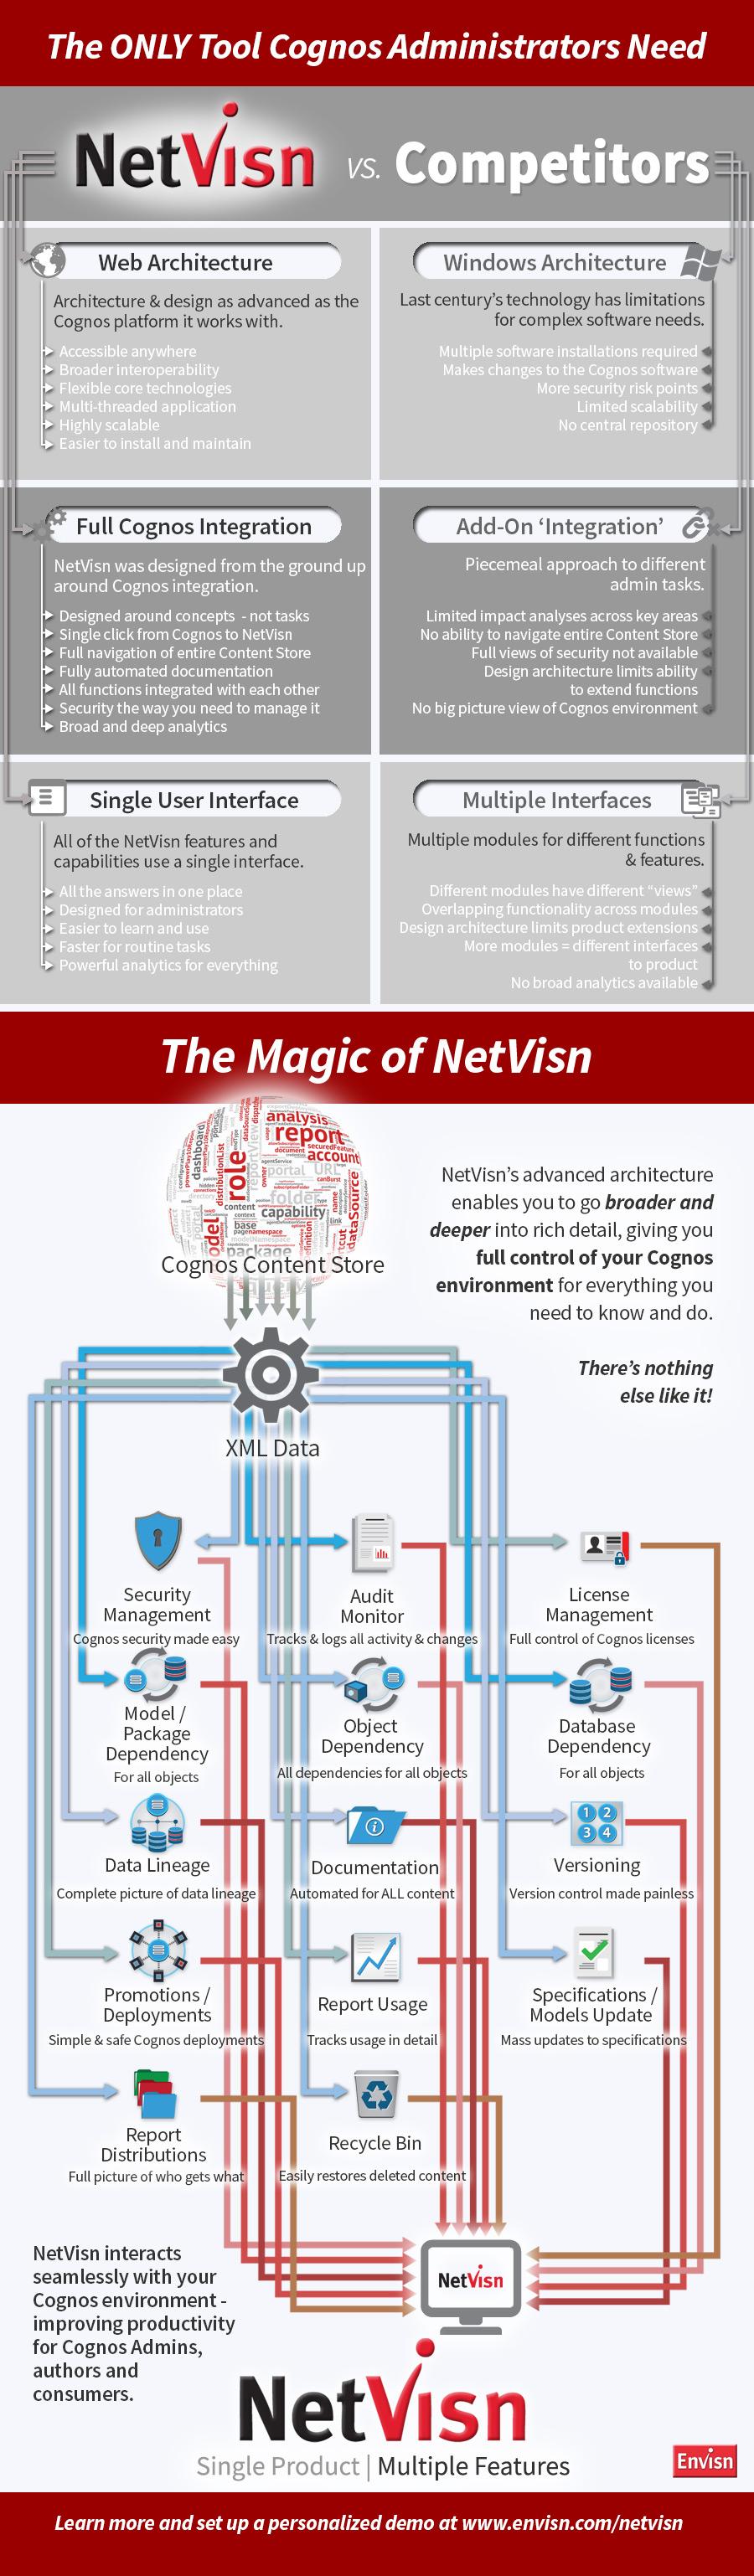 Netvisn vs other cognos tools